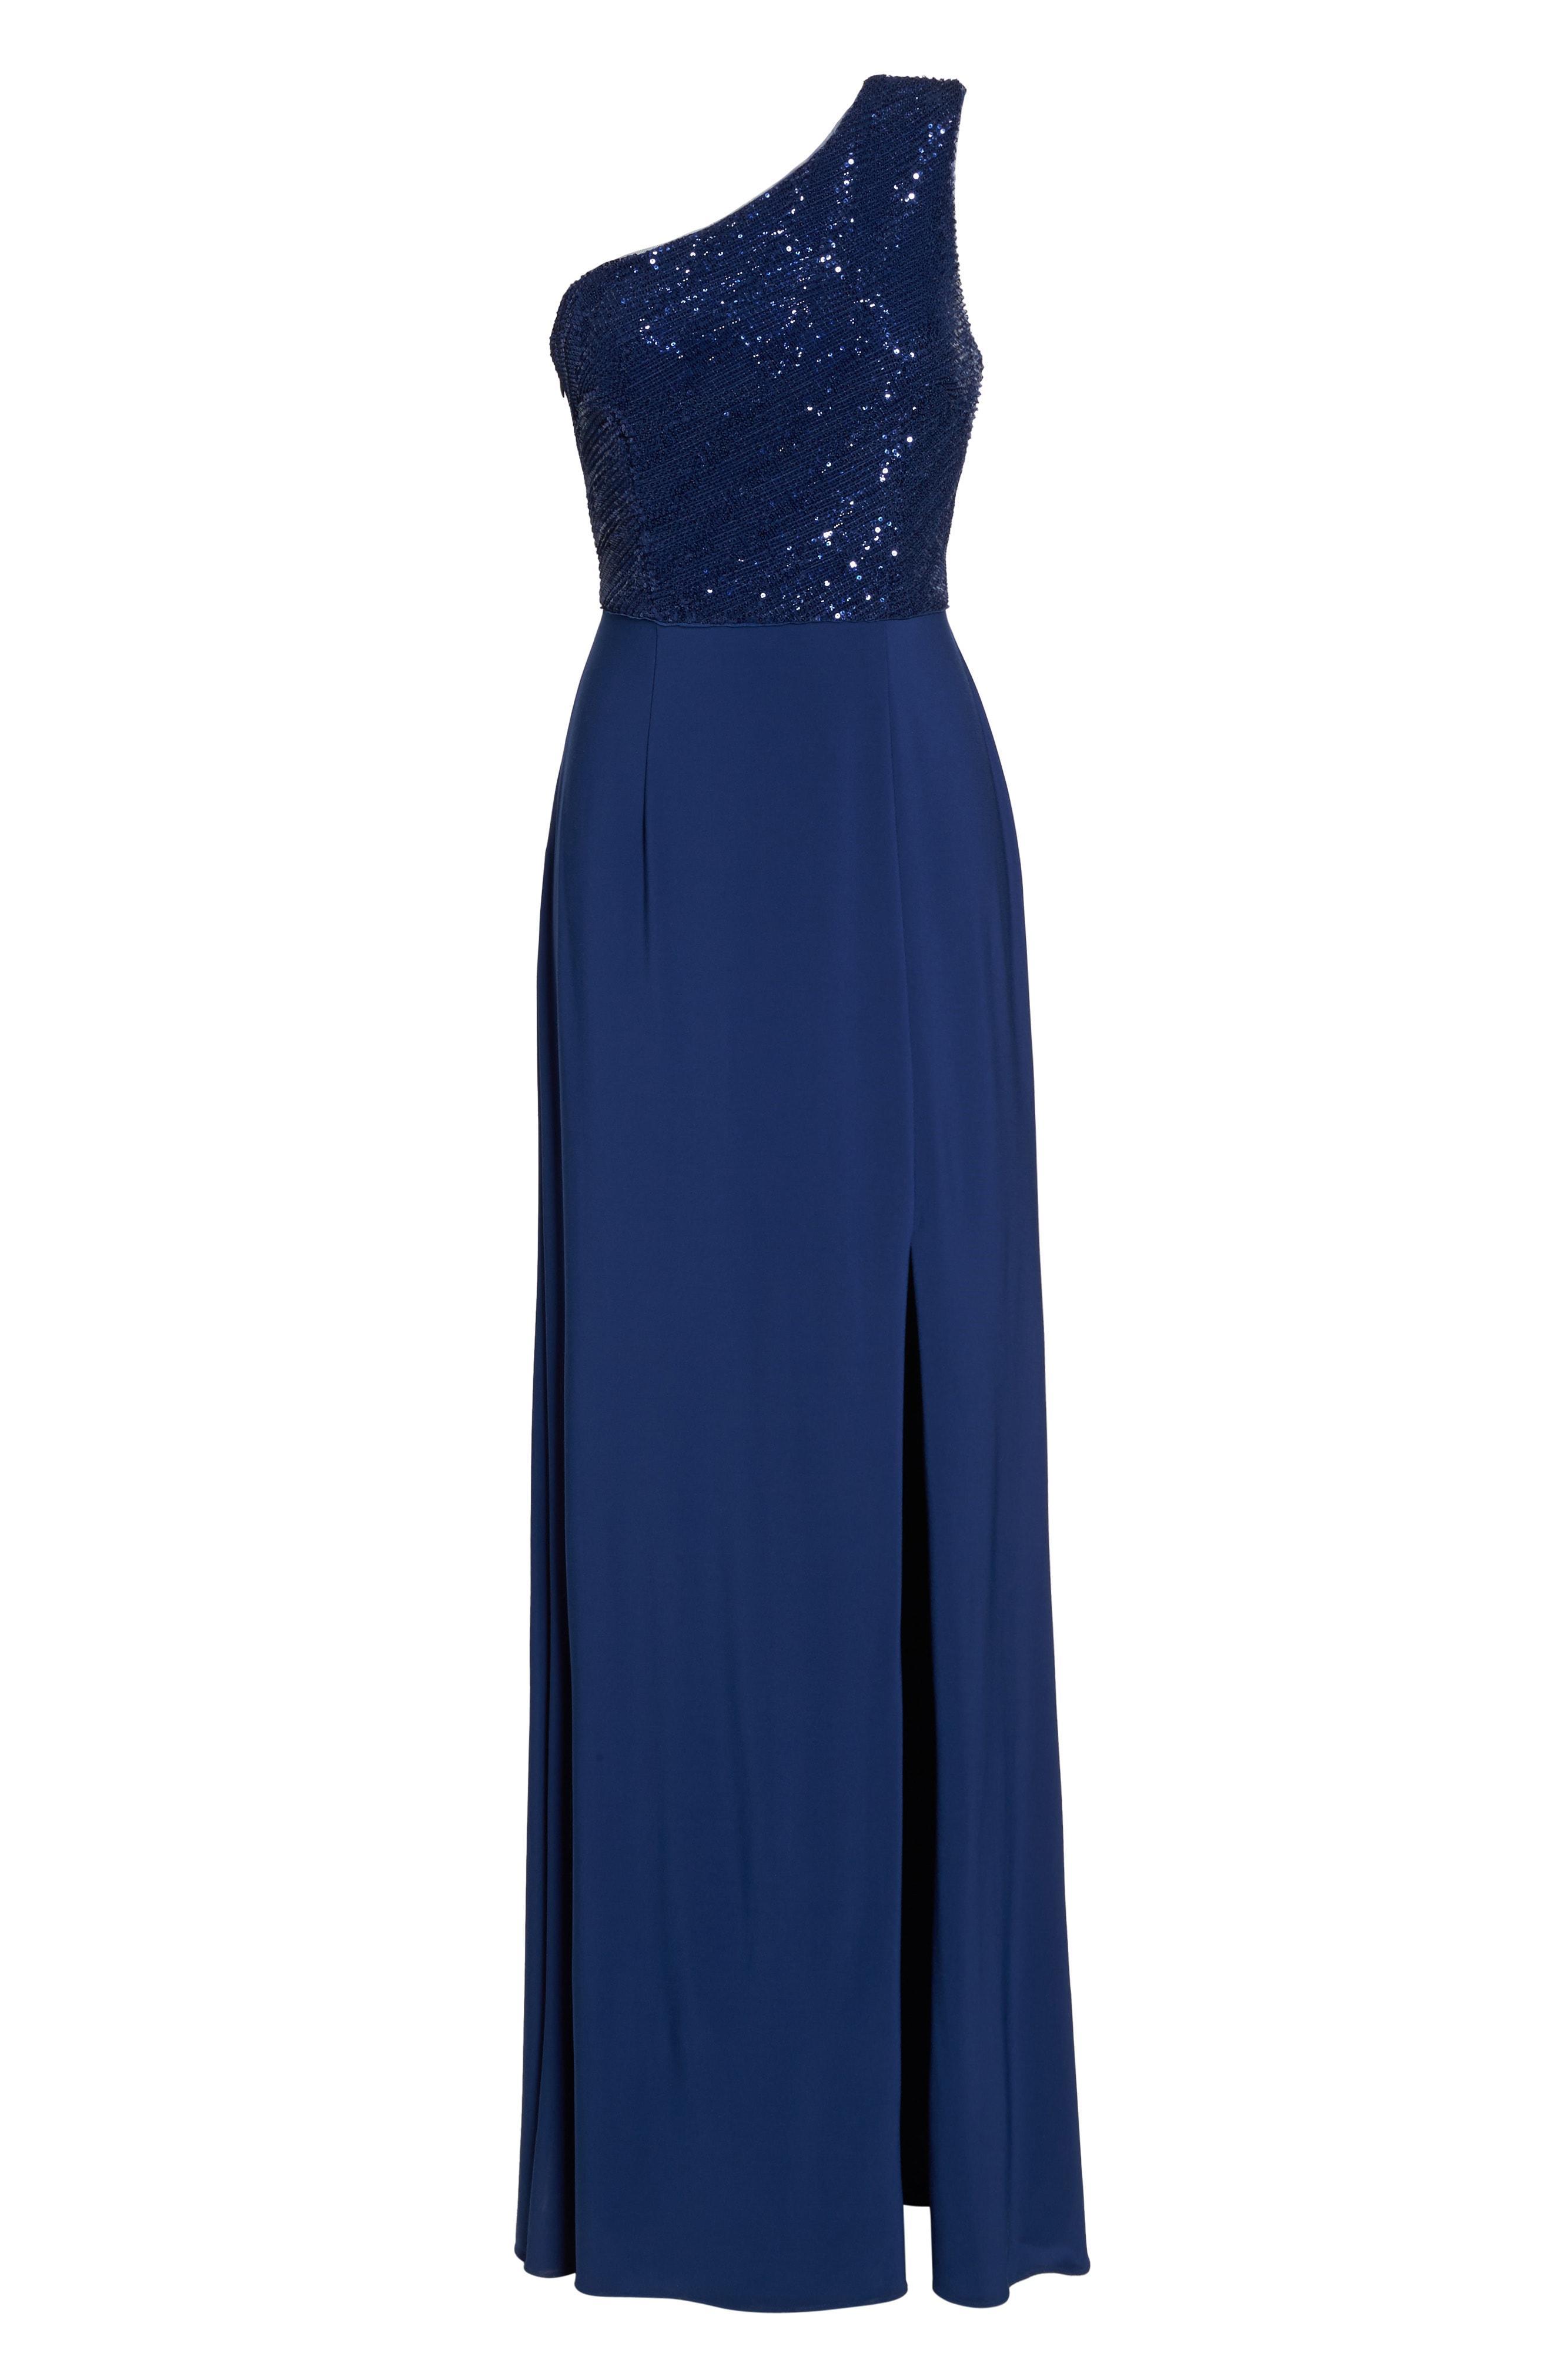 Lyst - Adrianna Papell Sleeveless Origami Sheath Dress in Blue